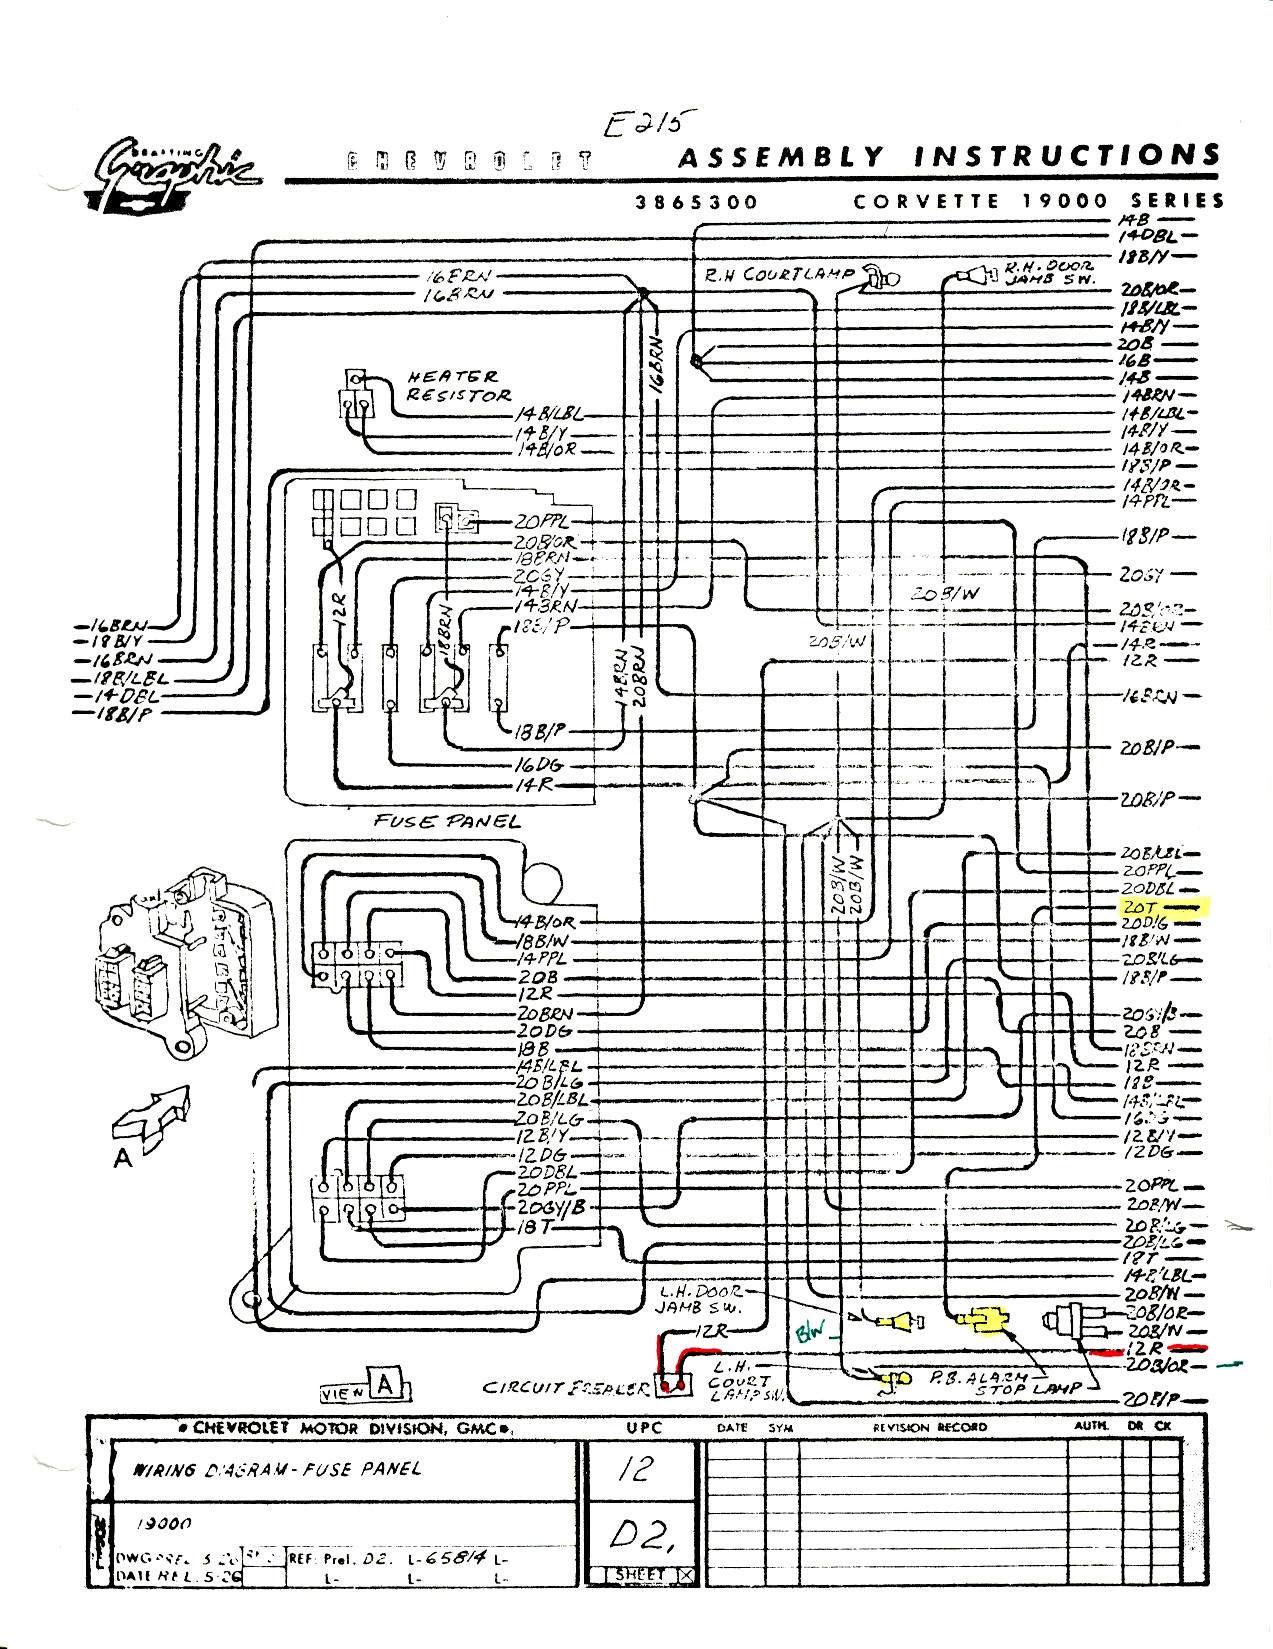 1969 Corvette Console Diagram Wiring Schematic Wiring Diagram Monitor1 Monitor1 Maceratadoc It